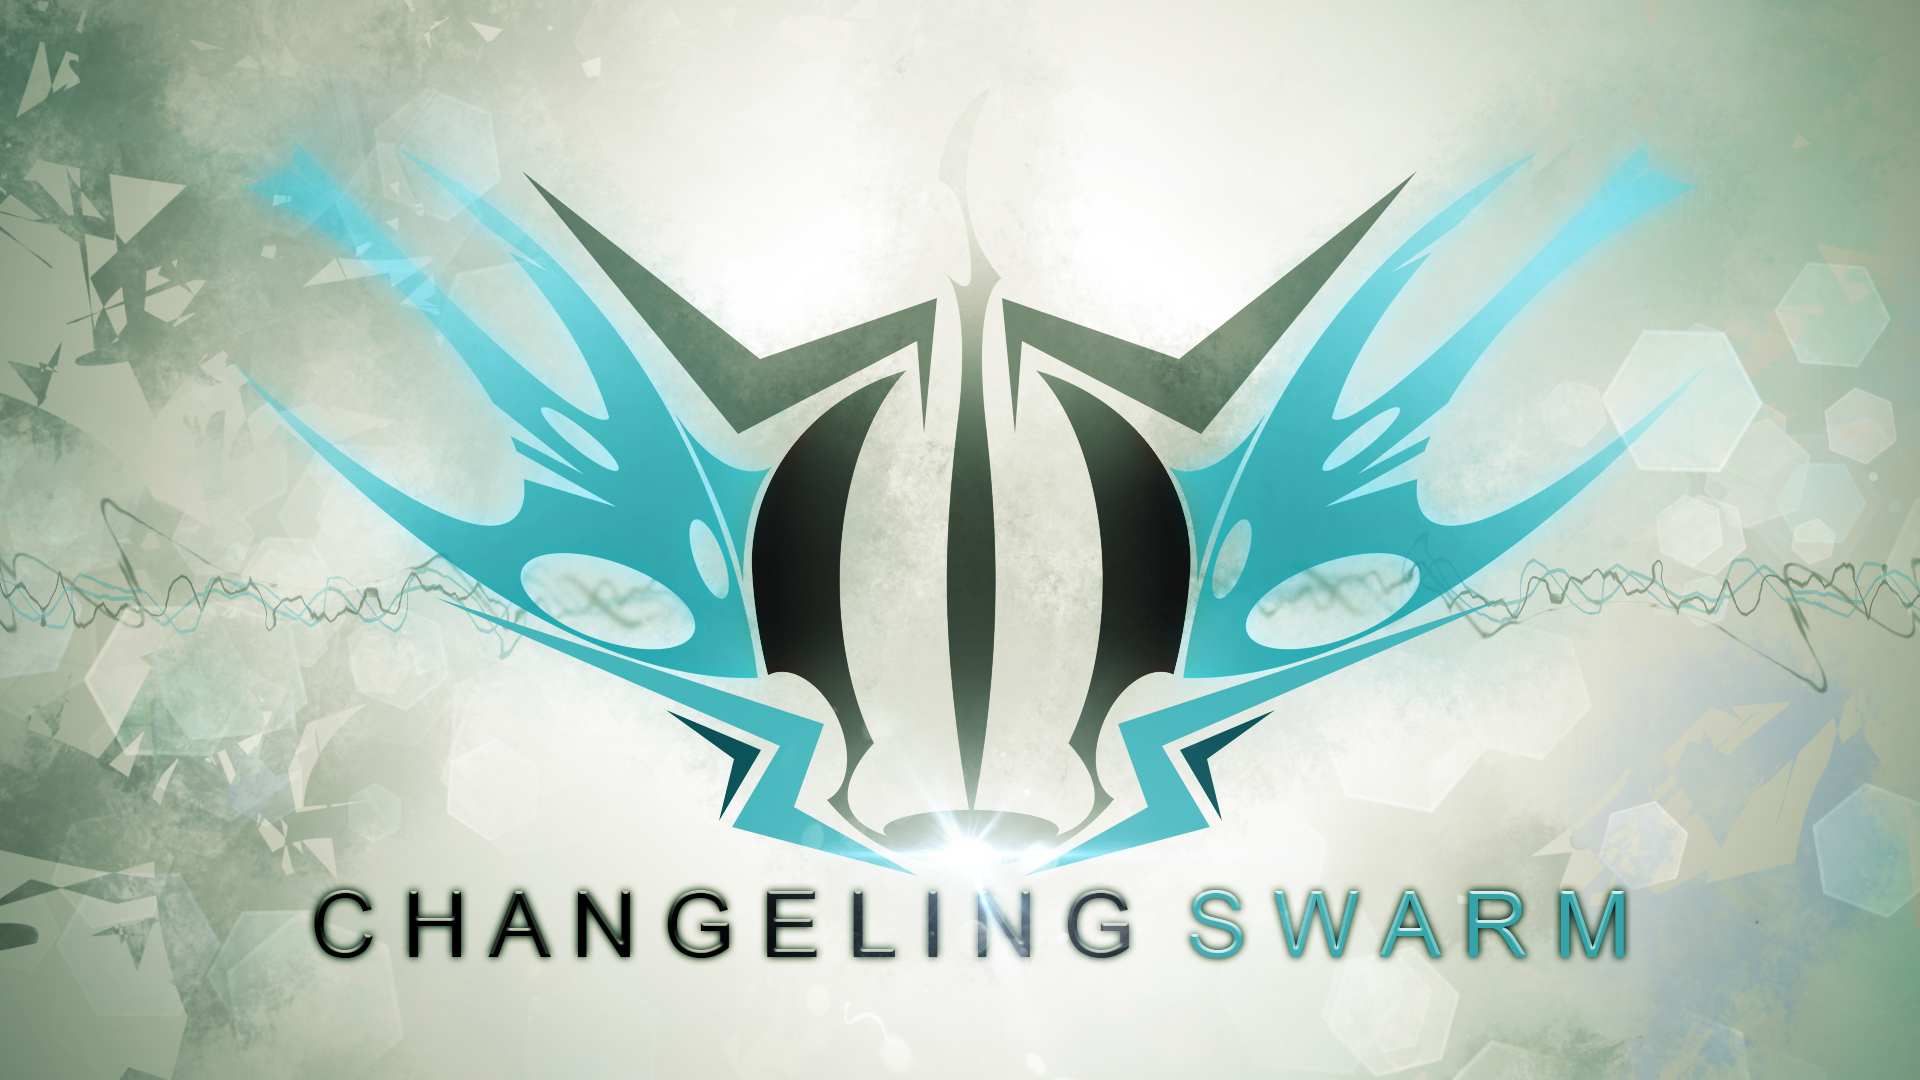 Changeling Swarm